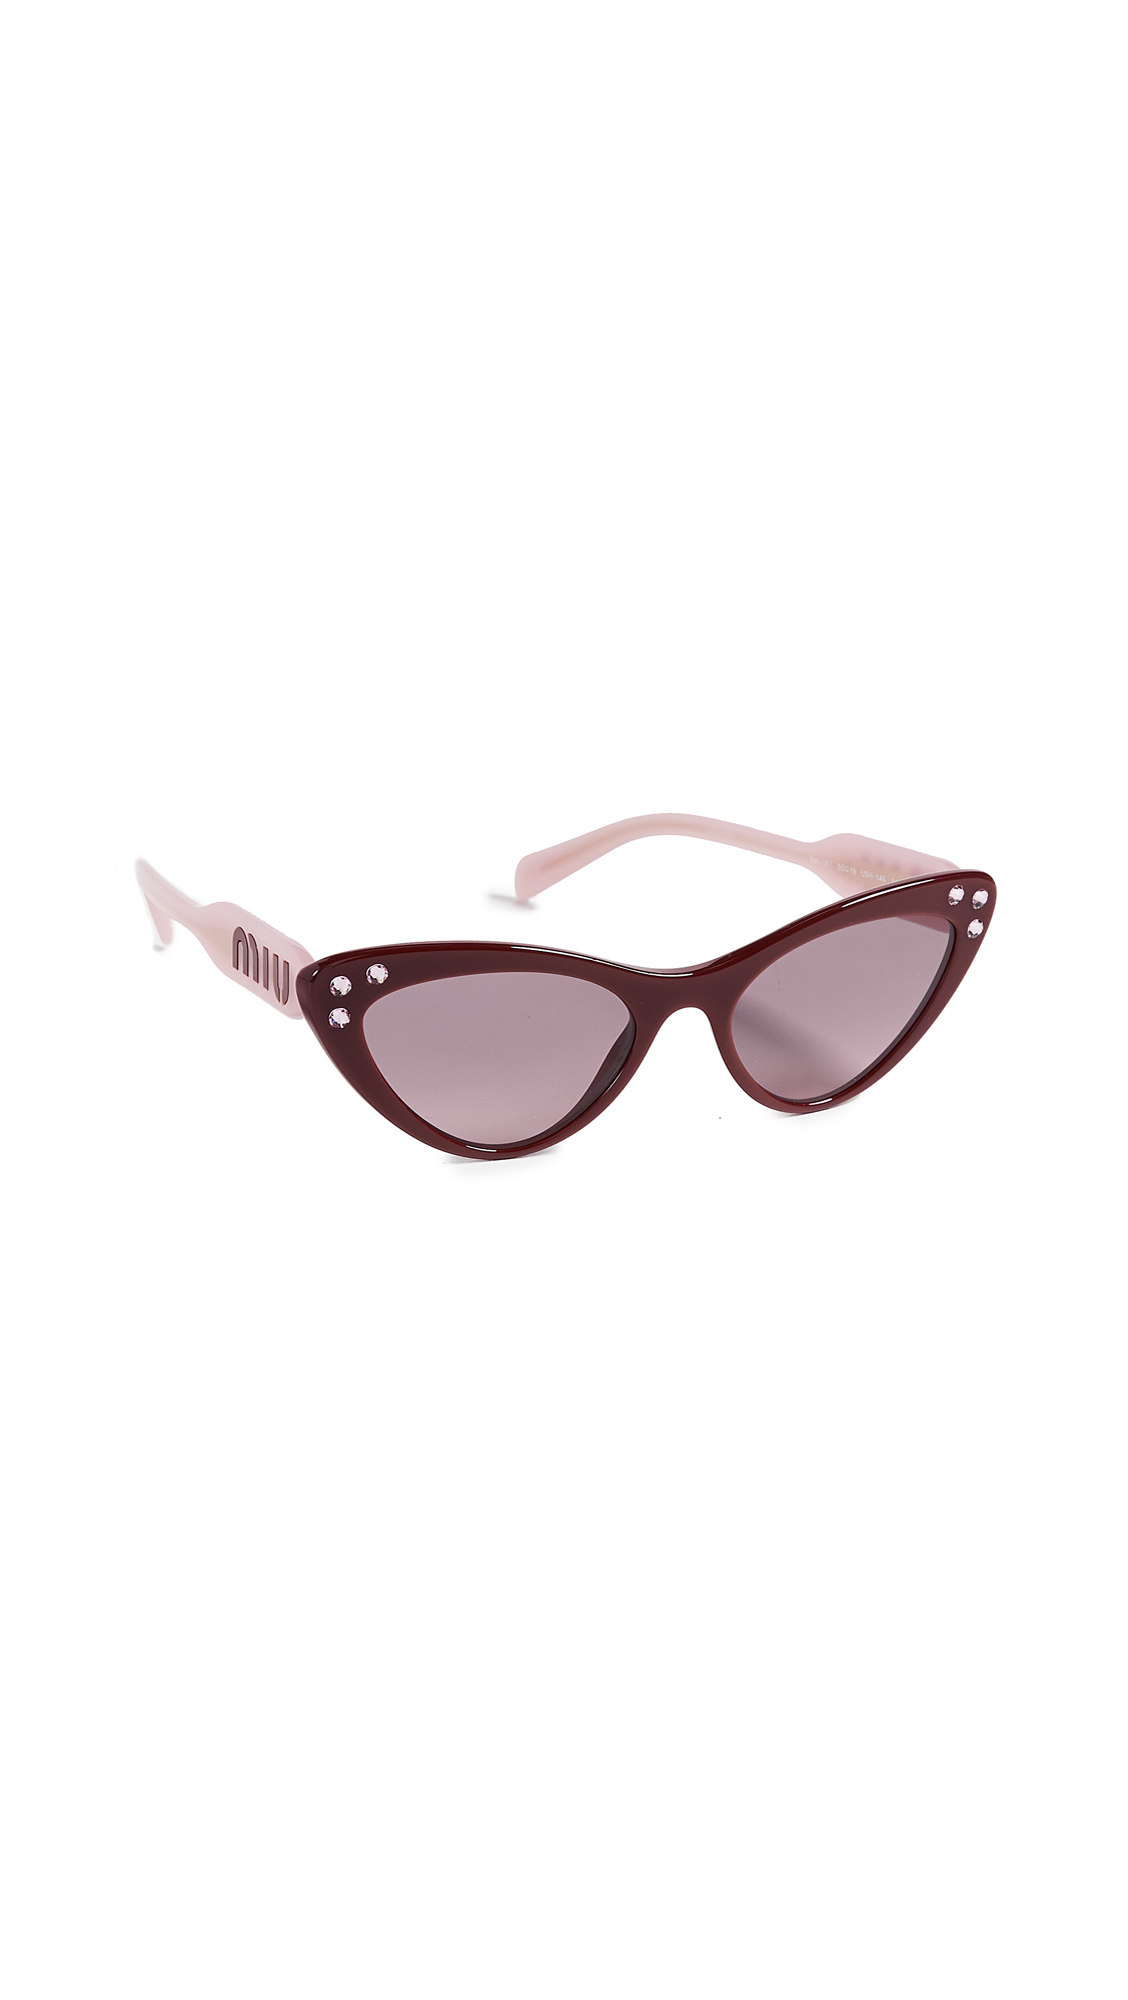 Crystals Cat Eye Sunglasses, Amaranth/Pink Gradient Grey